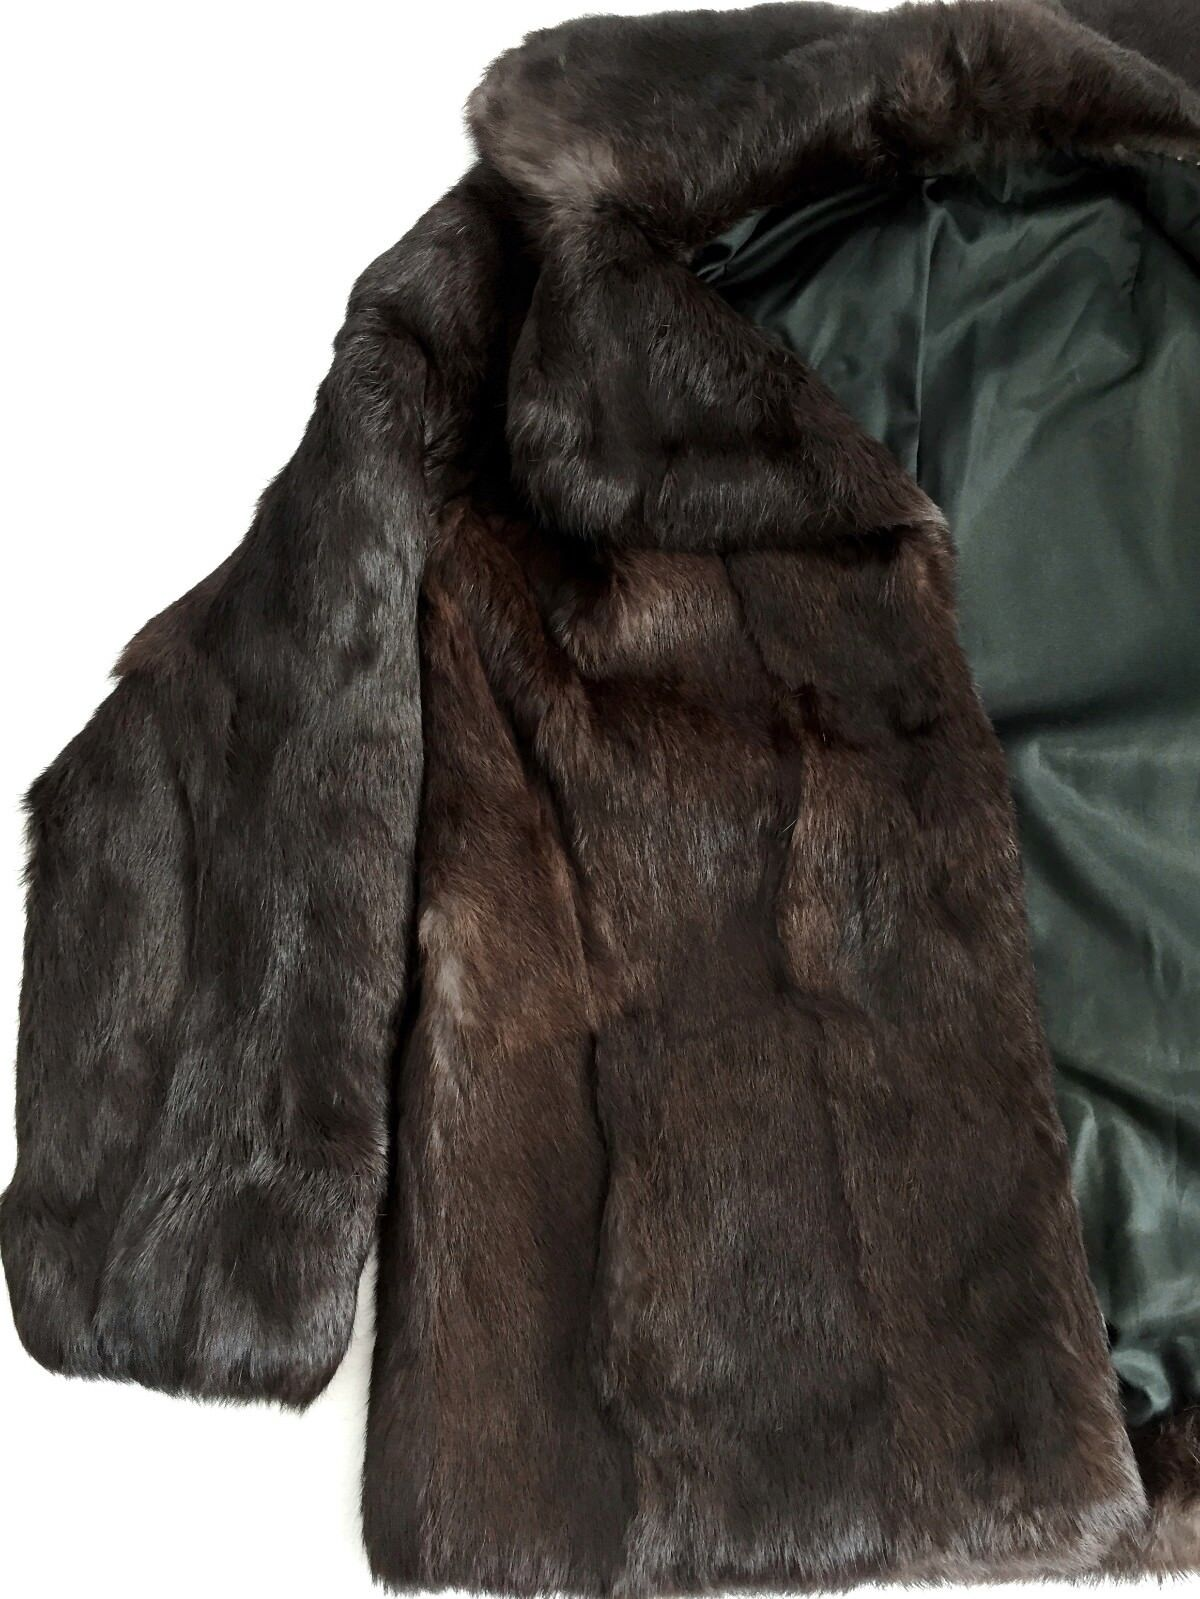 Vintage Women Real Genuine Fur Coat Coat Coat (Rabbit) Echt Pelz Immaculate Brown 8 M 10 L 45e169